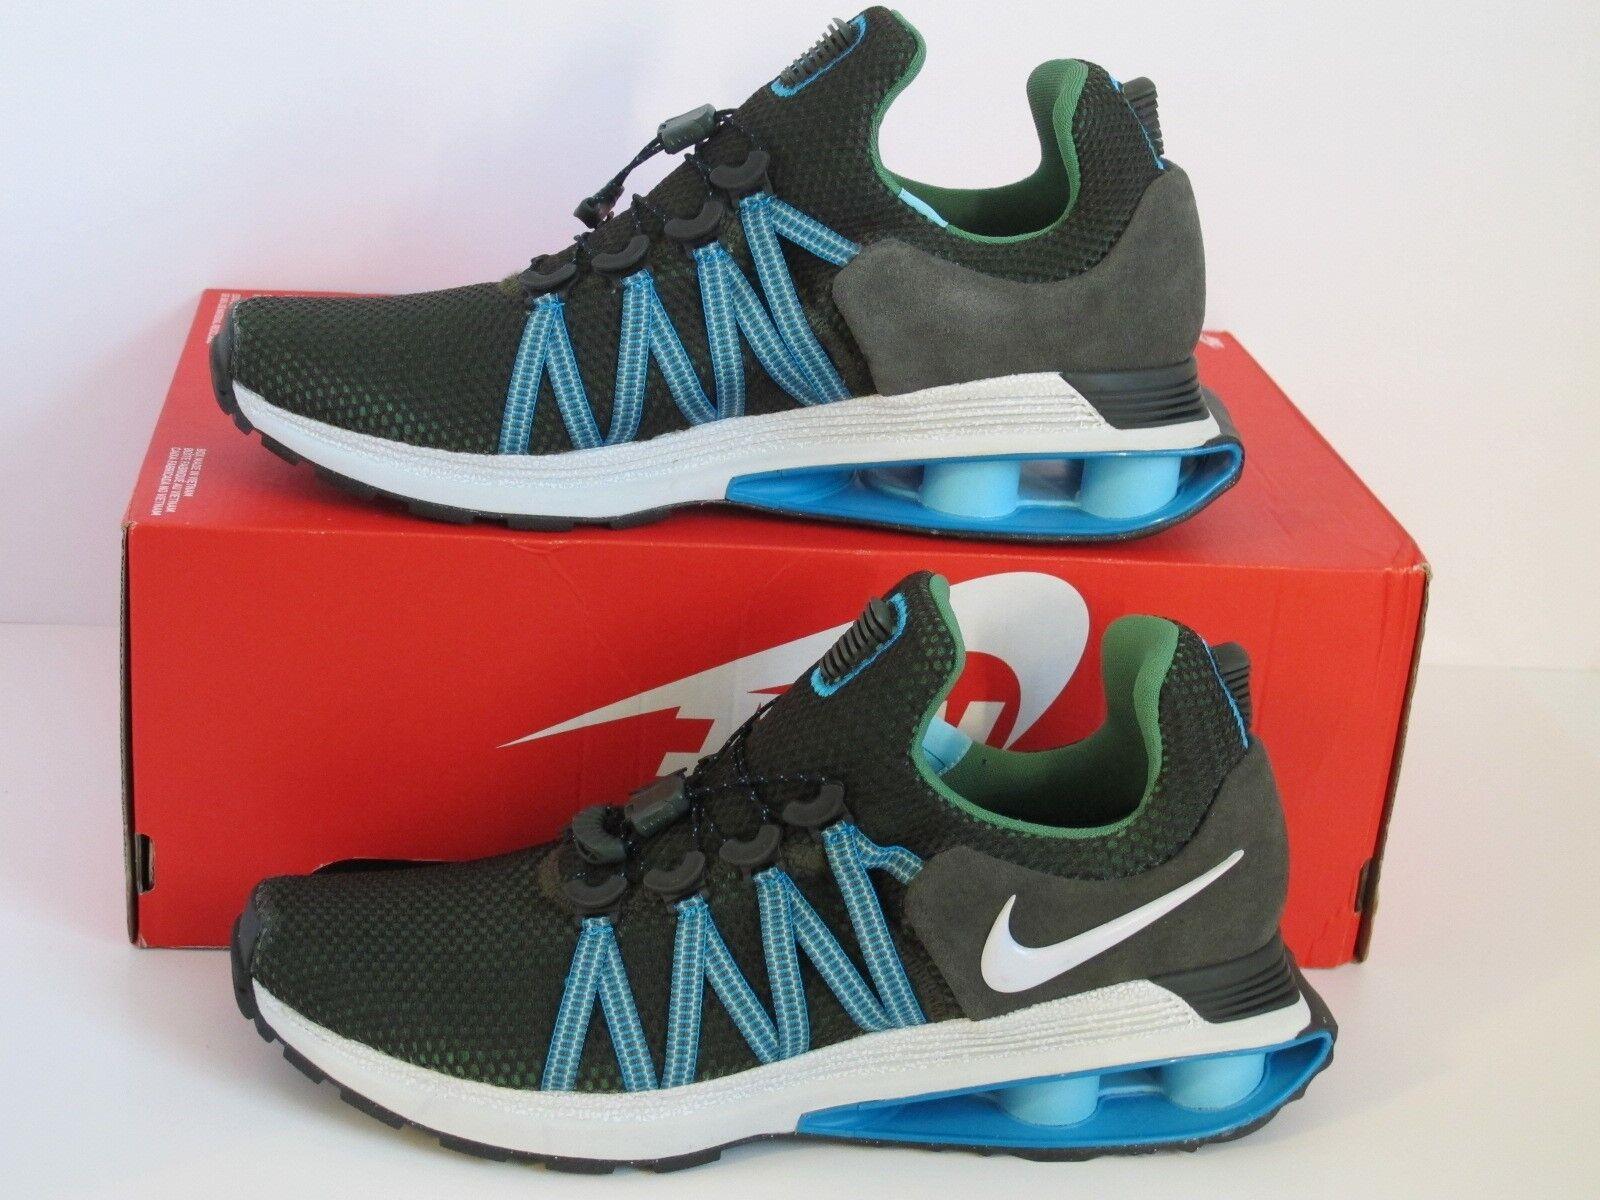 NEW Nike Shox Gravity Men's Running shoes Sz 10.5